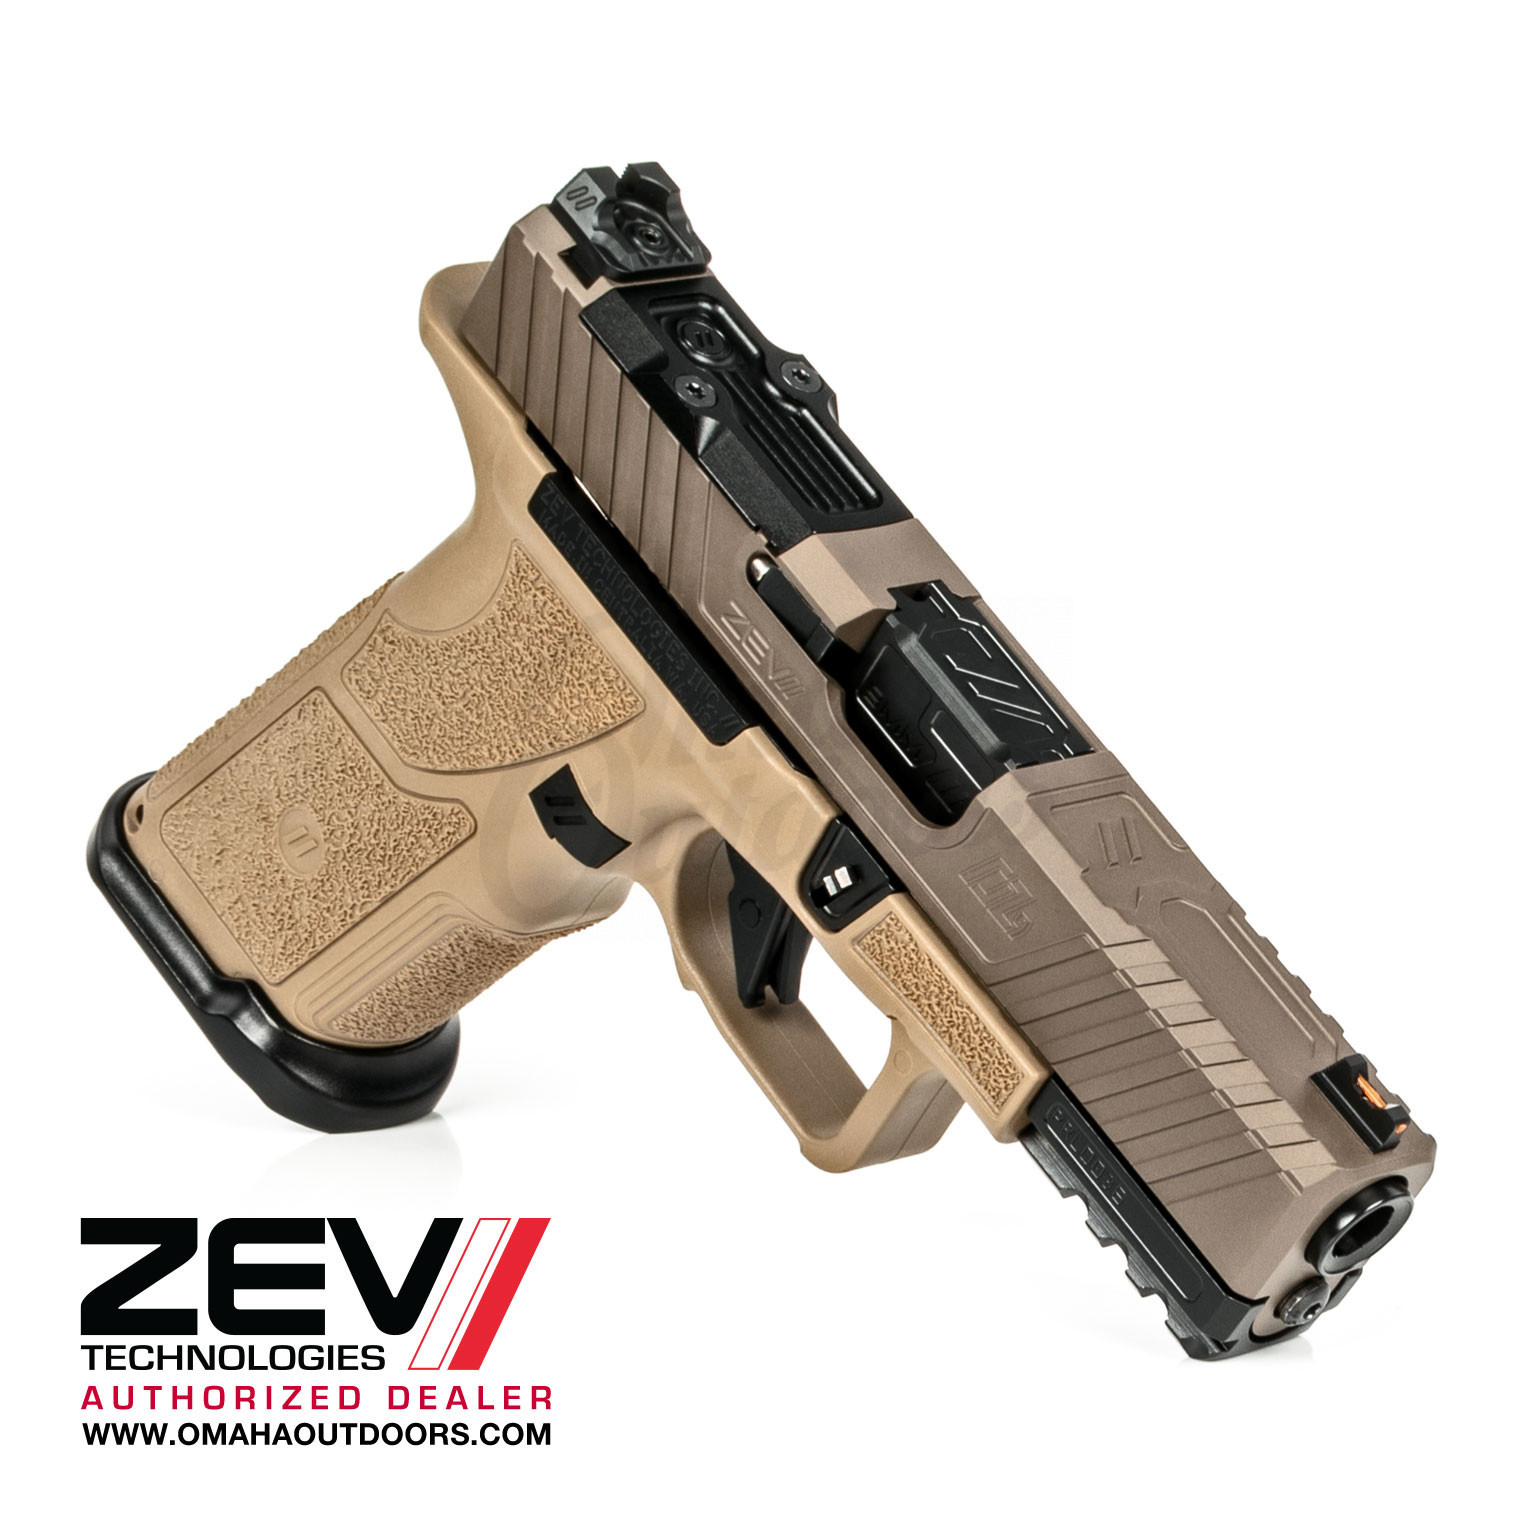 Zev Tech Oz9 Compact X Pistol 9mm Fde 17 Rd Oz9c